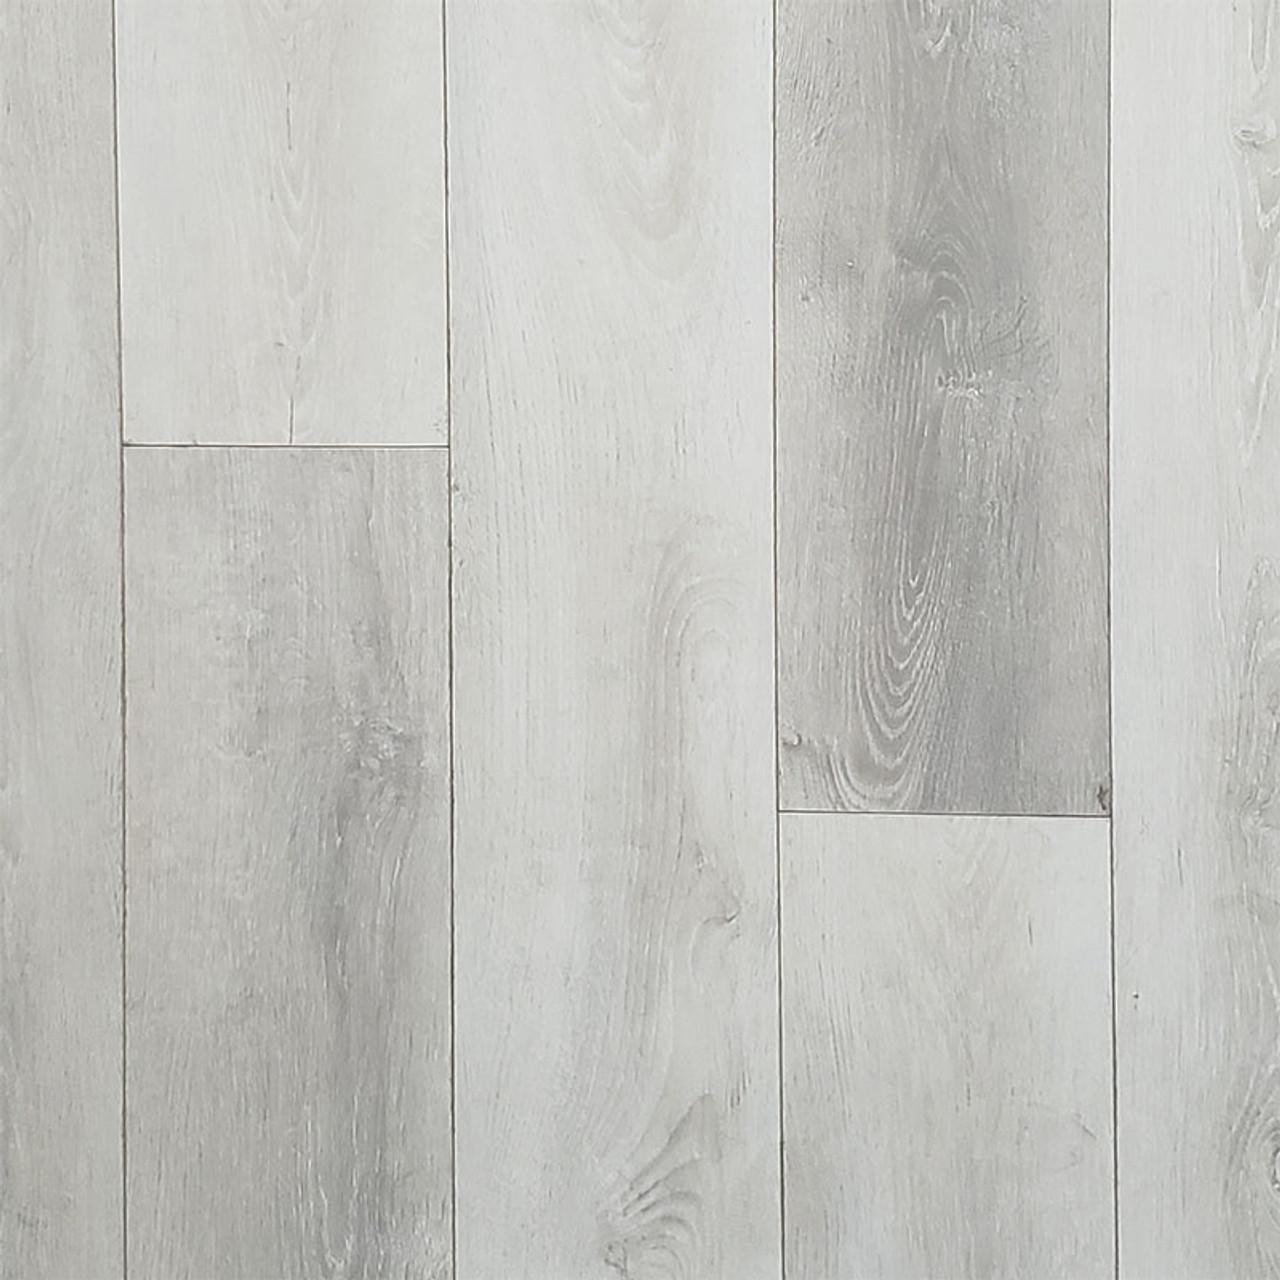 12mm Sandcream Port Laminate Flooring | 15.55 Sq.Ft. Per Box | Sold by the Box